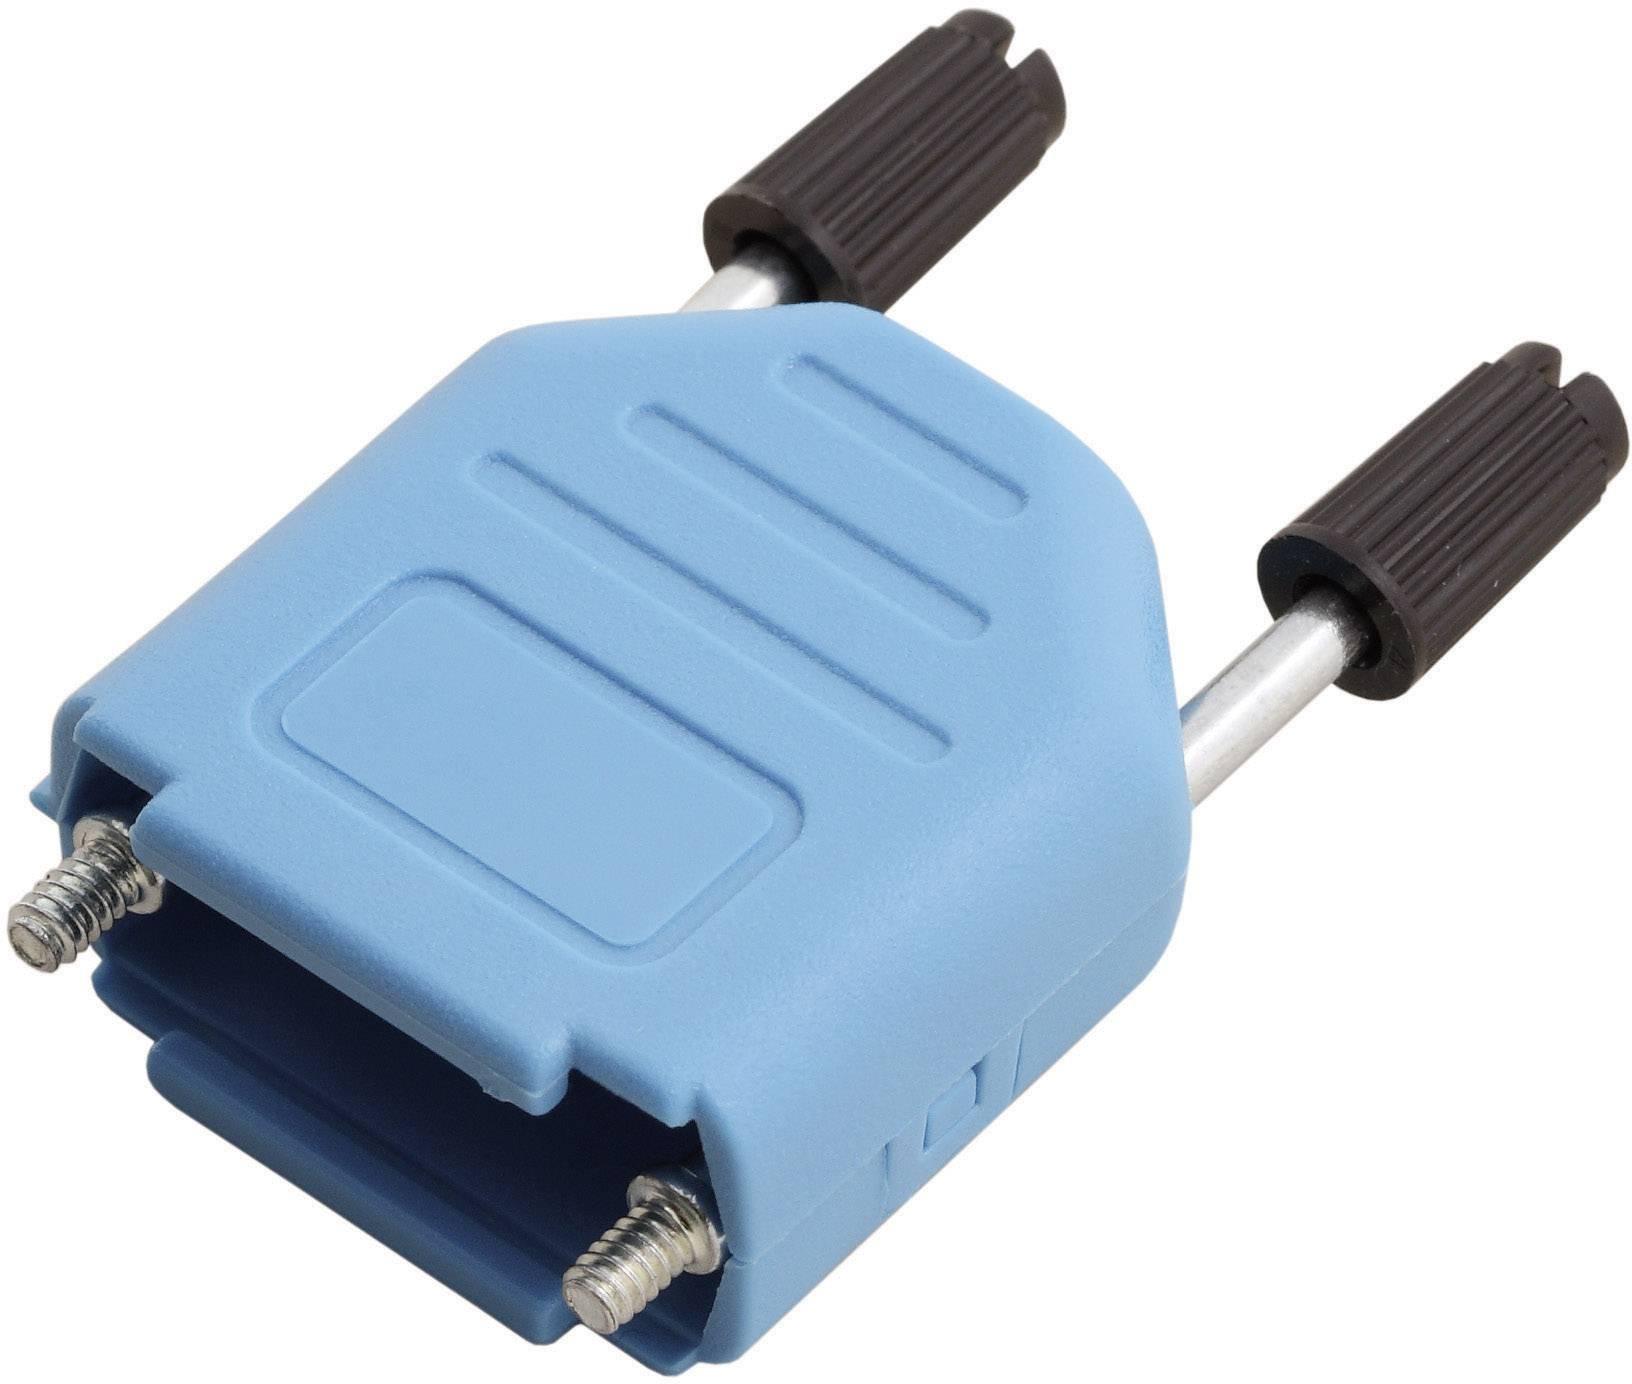 D-SUB púzdro MH Connectors MHDPPK37-B-K 6353-0104-04, Počet pinov: 37, plast, 180 °, modrá, 1 ks